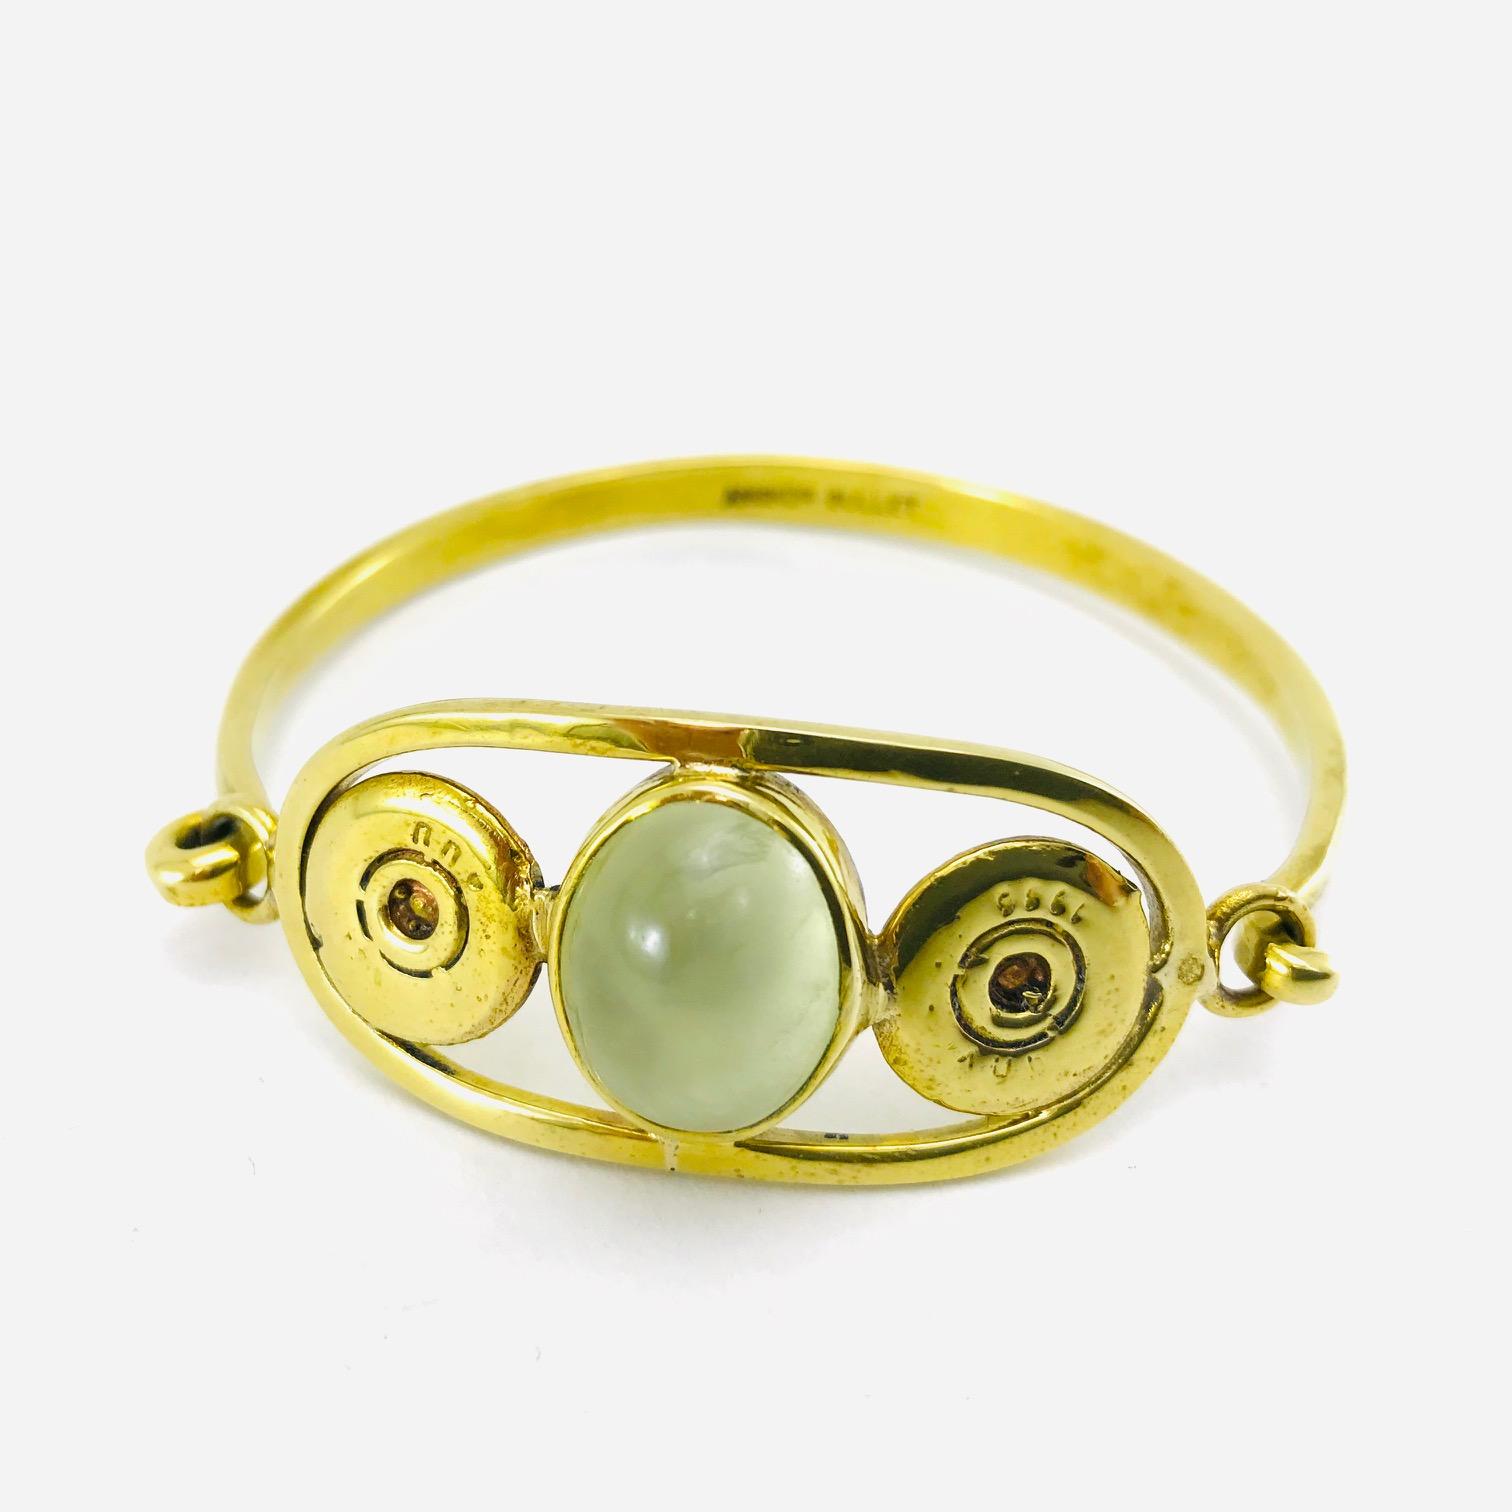 Bracelet Jonc - Douille De Balle Recyclée - Topaze